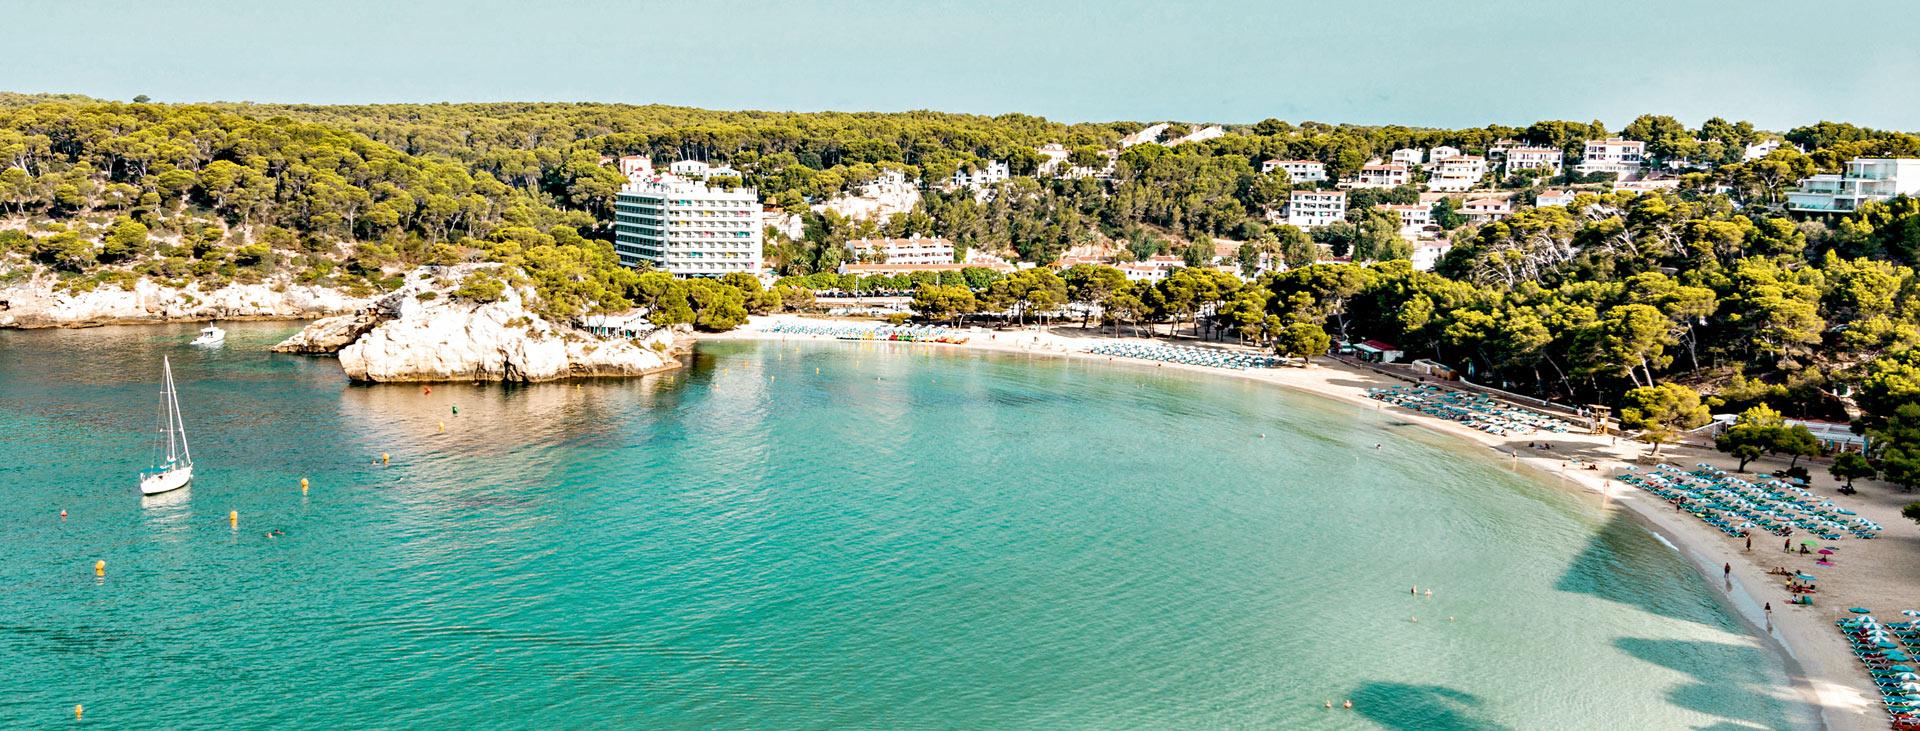 Artiem Audax Hotel, Cala Galdana, Menorca, Spanien